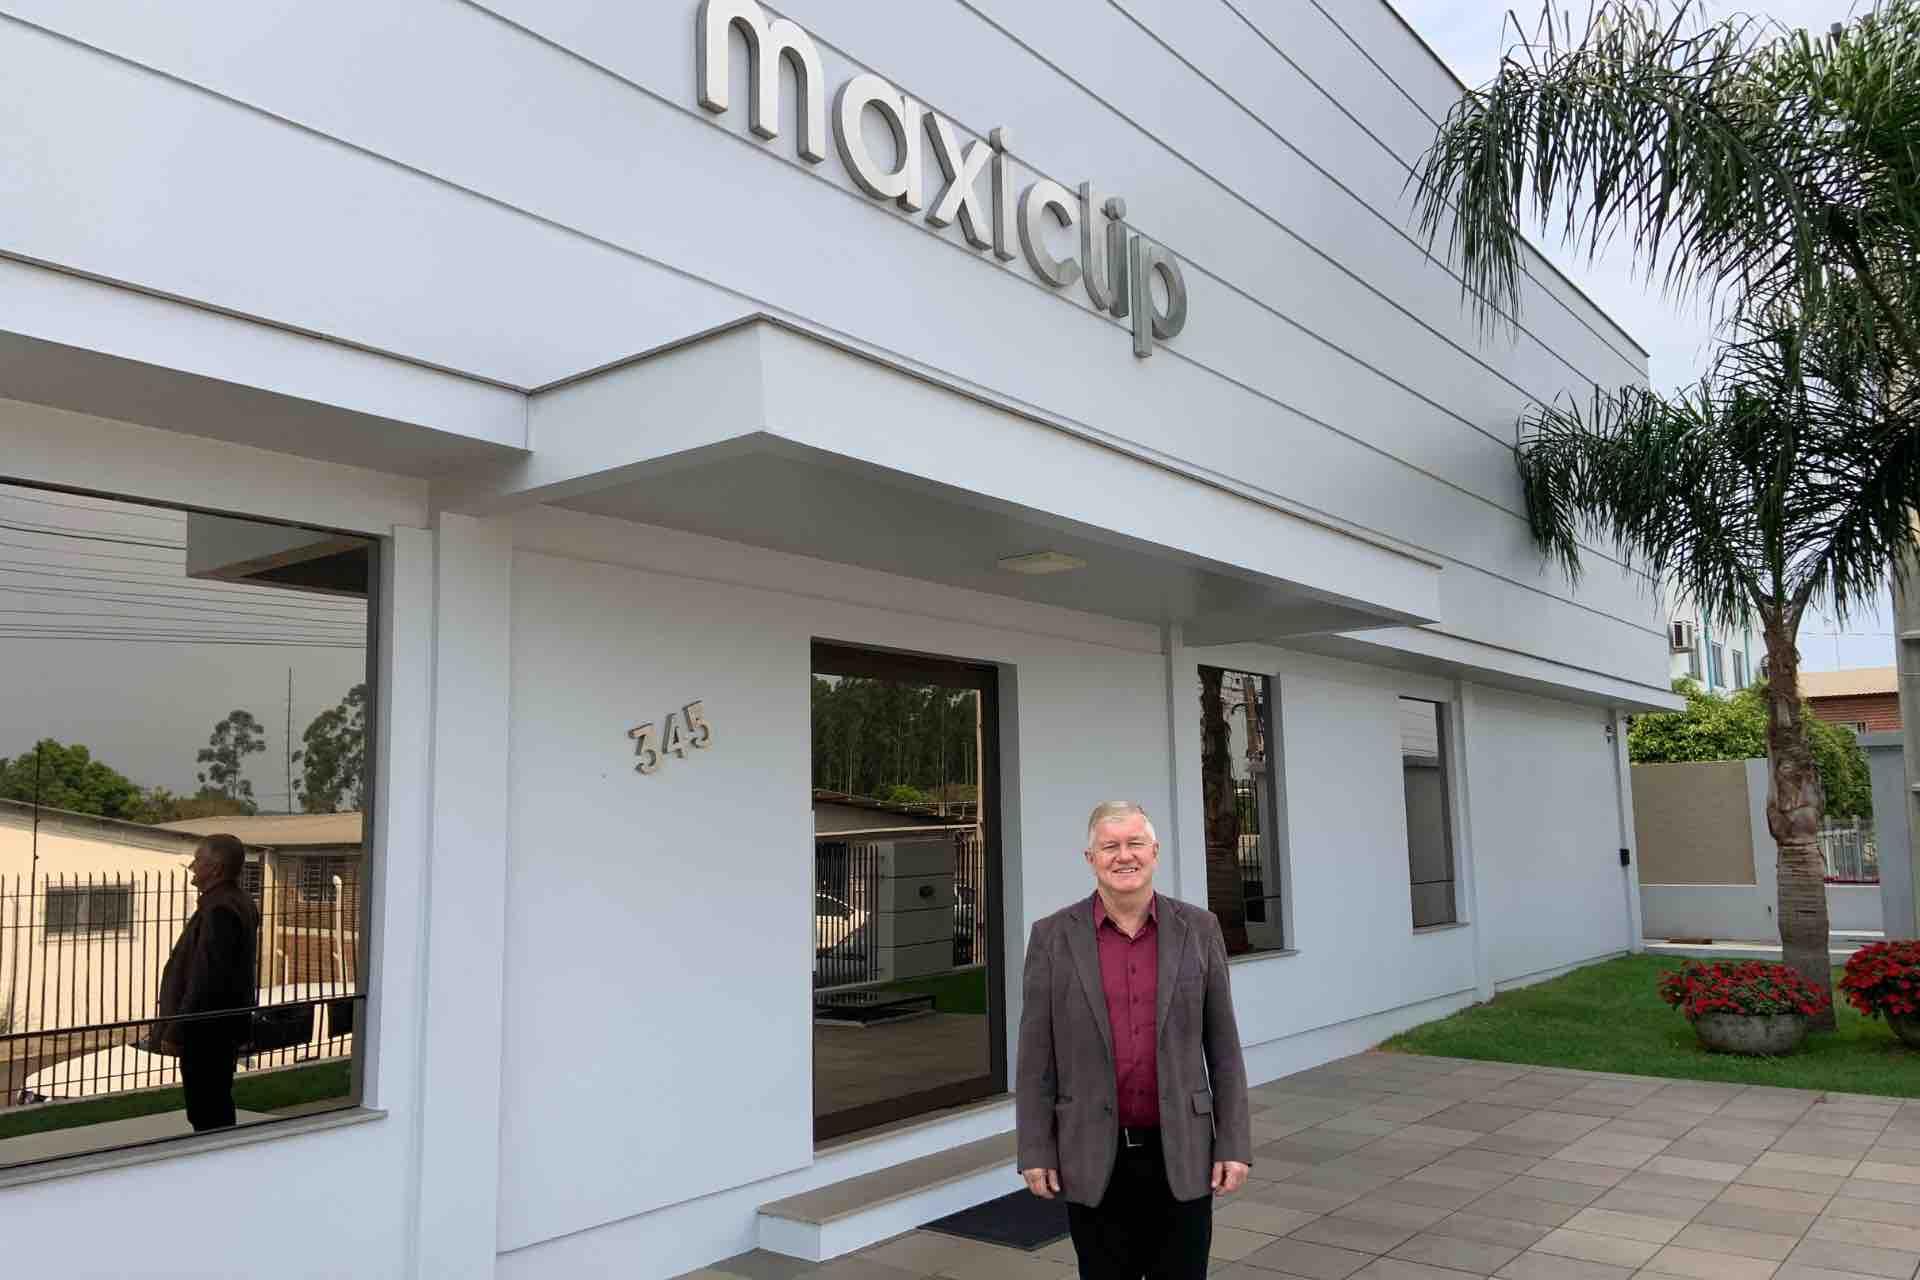 Diretor Maxiclip